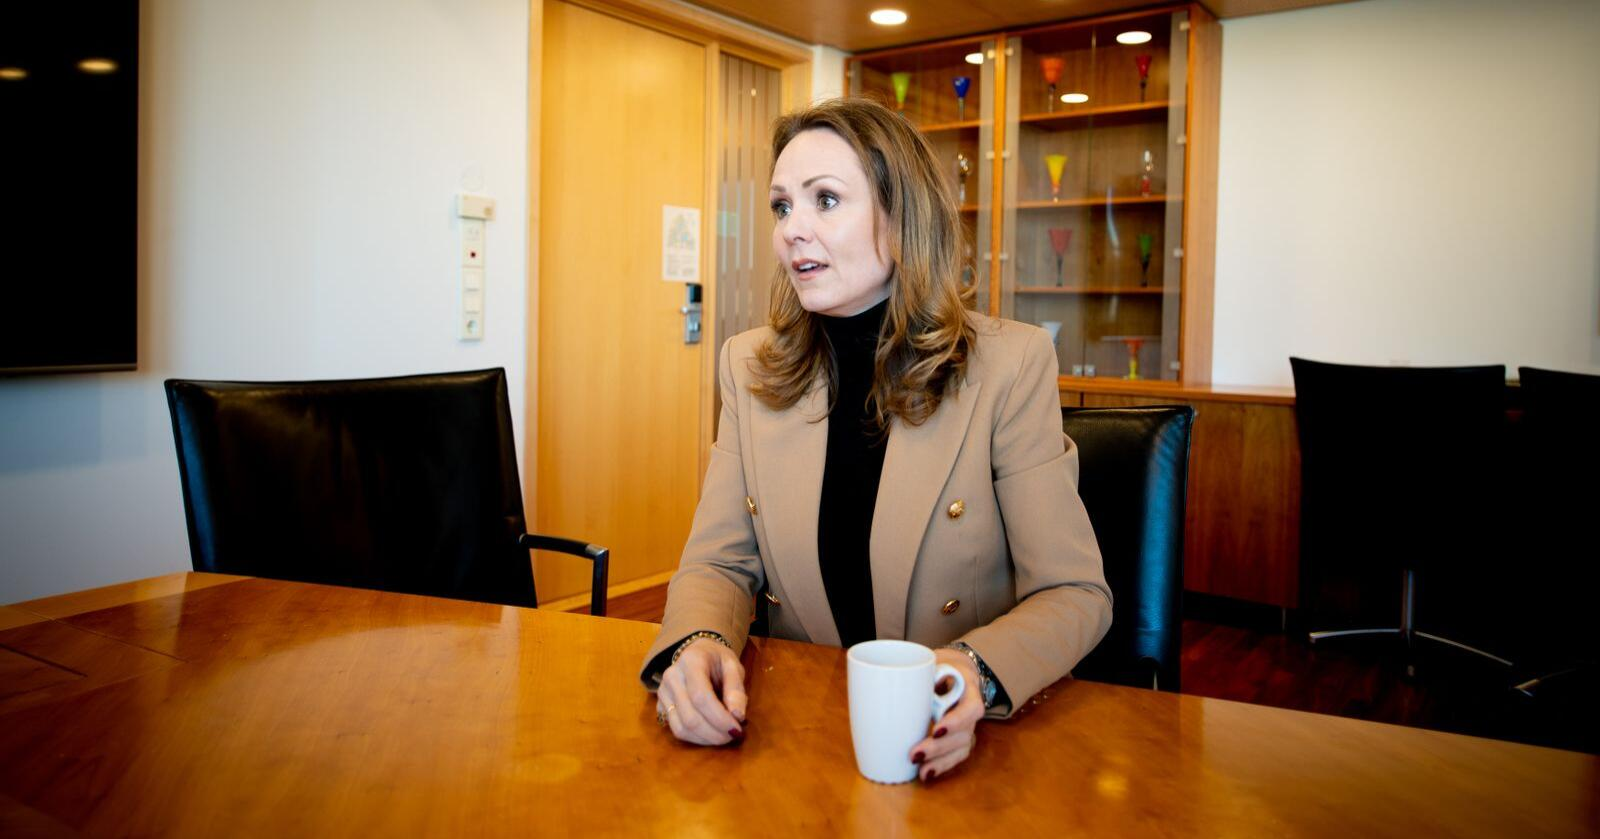 Lederen av Høyres programkomité, Linda Hofstad Helleland, i samtale med Nationens journalist, Henrik Heldahl. Foto: Vidar Sandnes